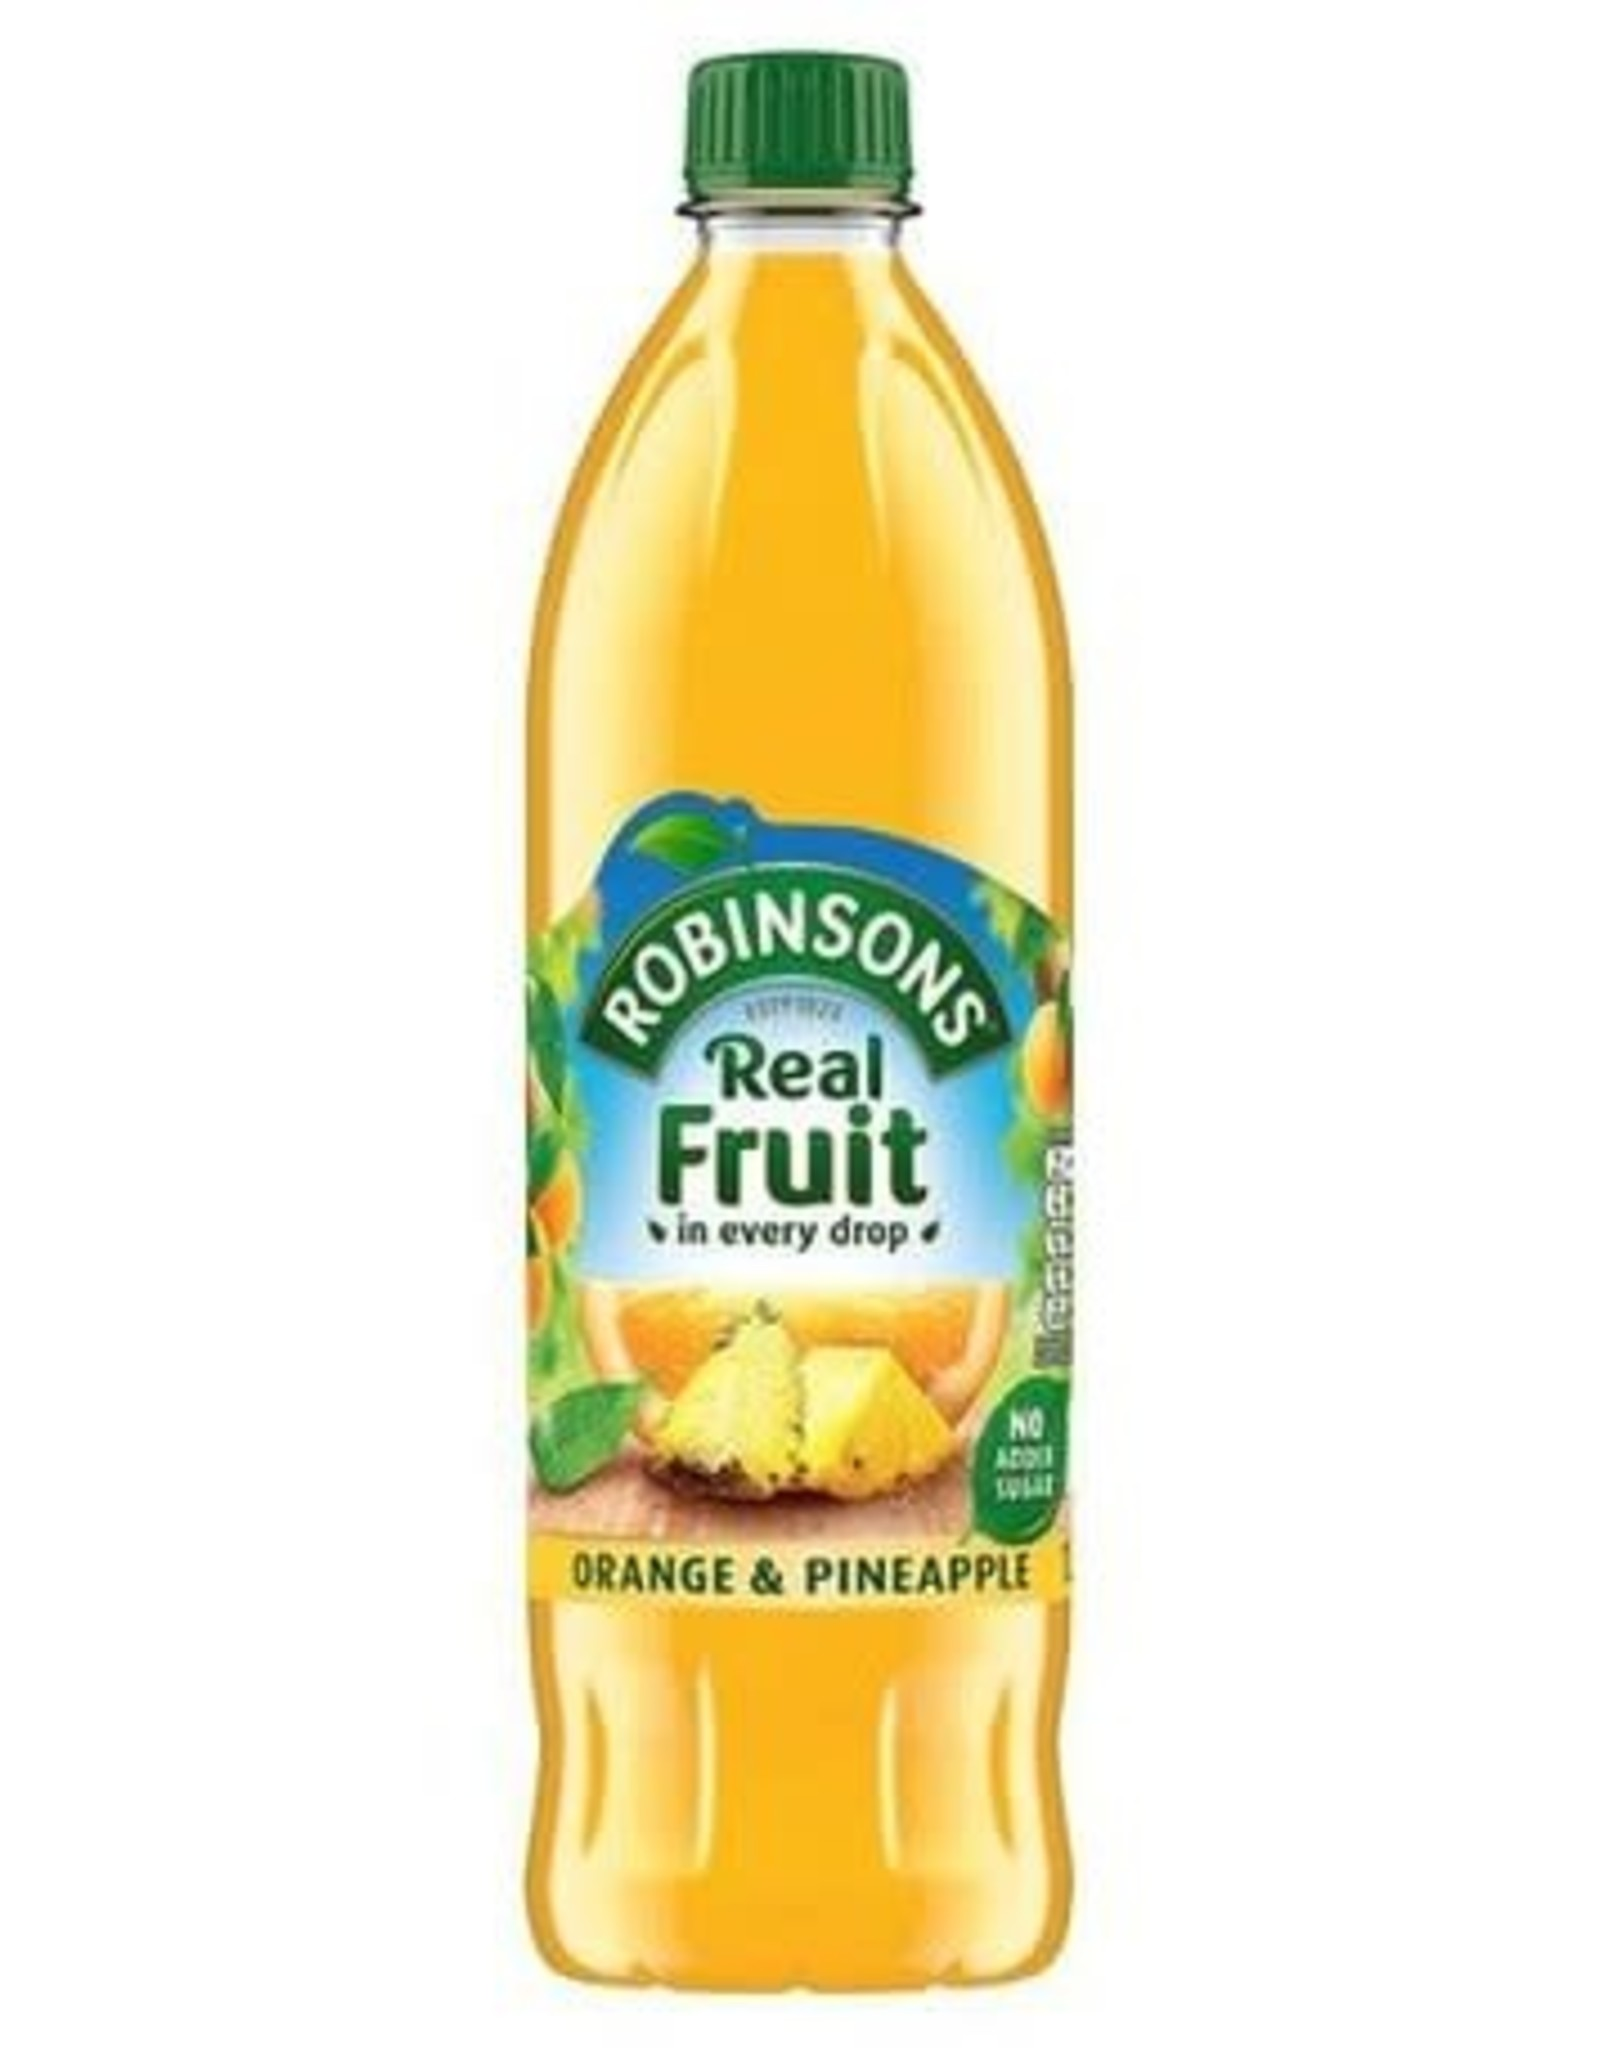 Robinson's Robinsonss Real Fruit Barley 1 L Orange & Pineapple